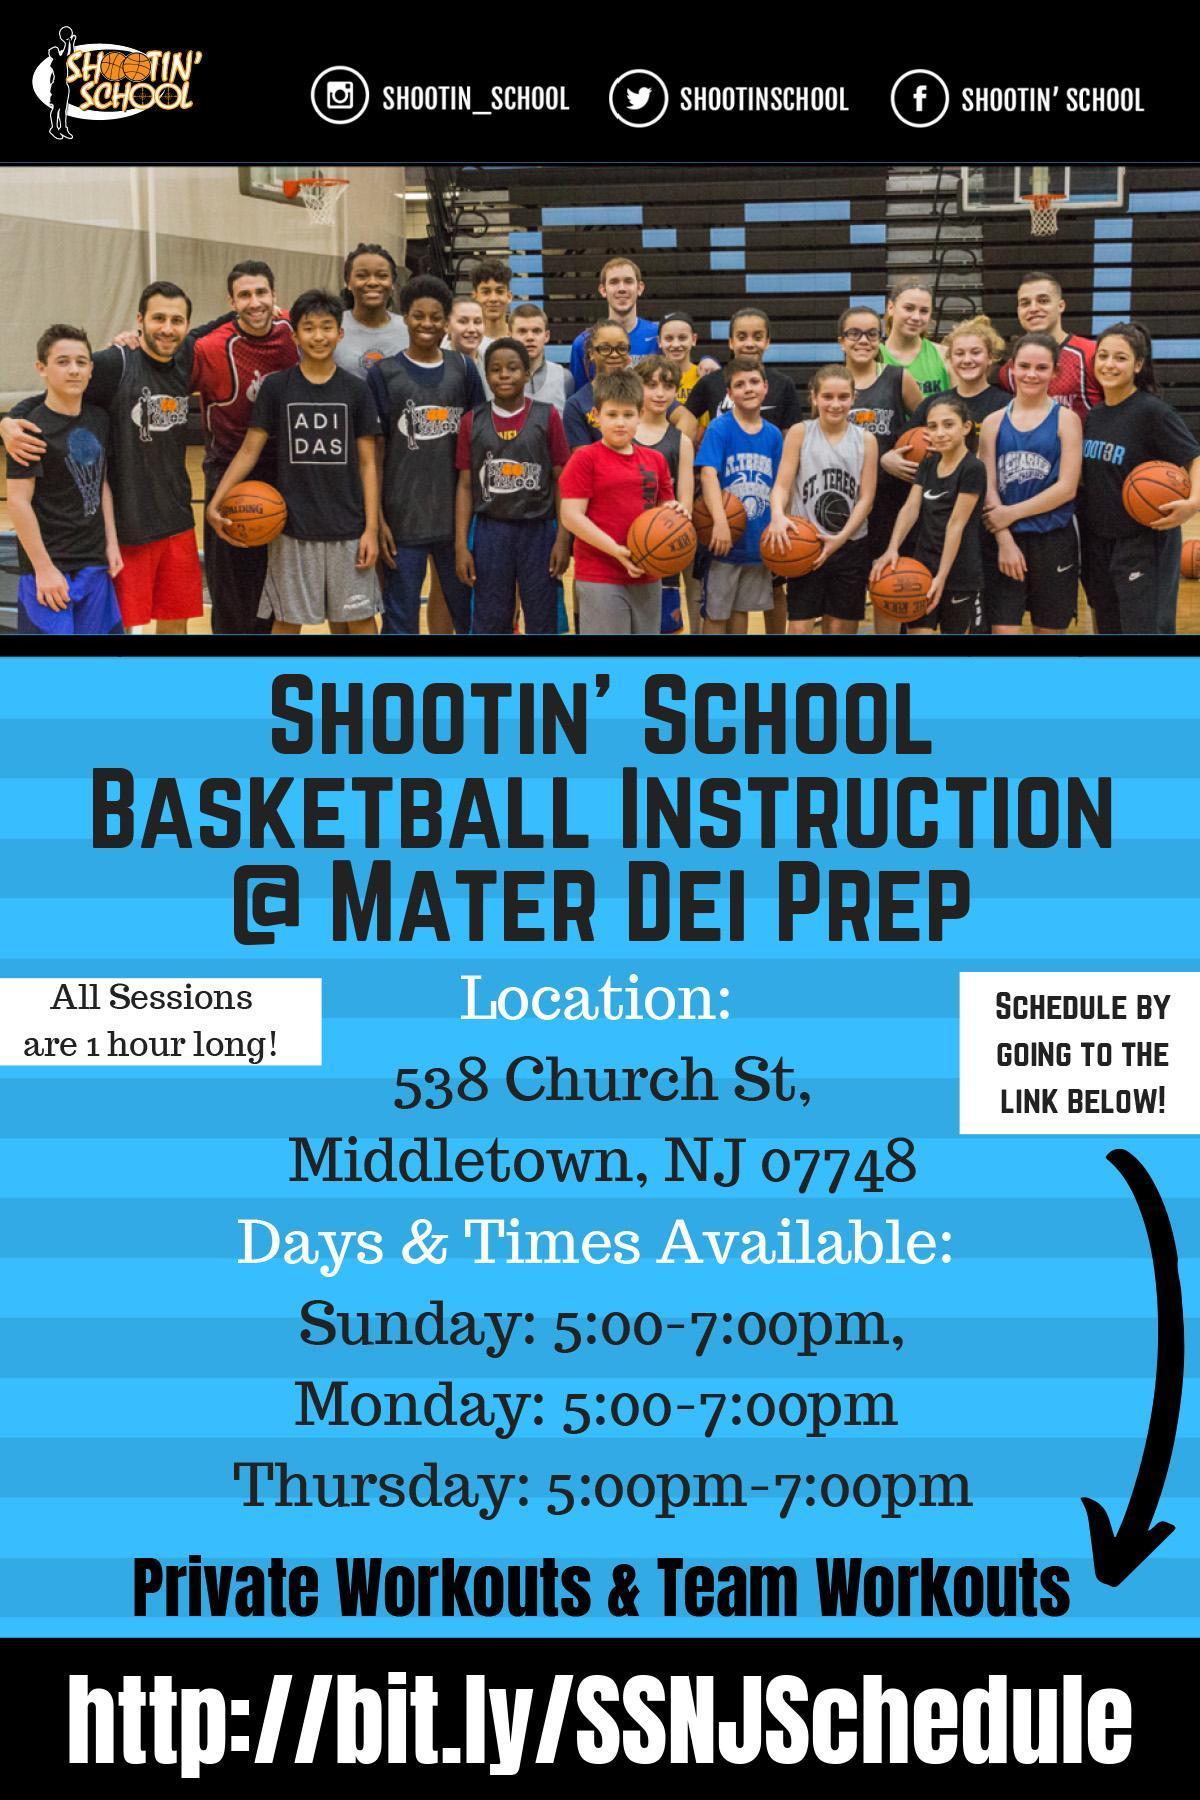 shootinschool